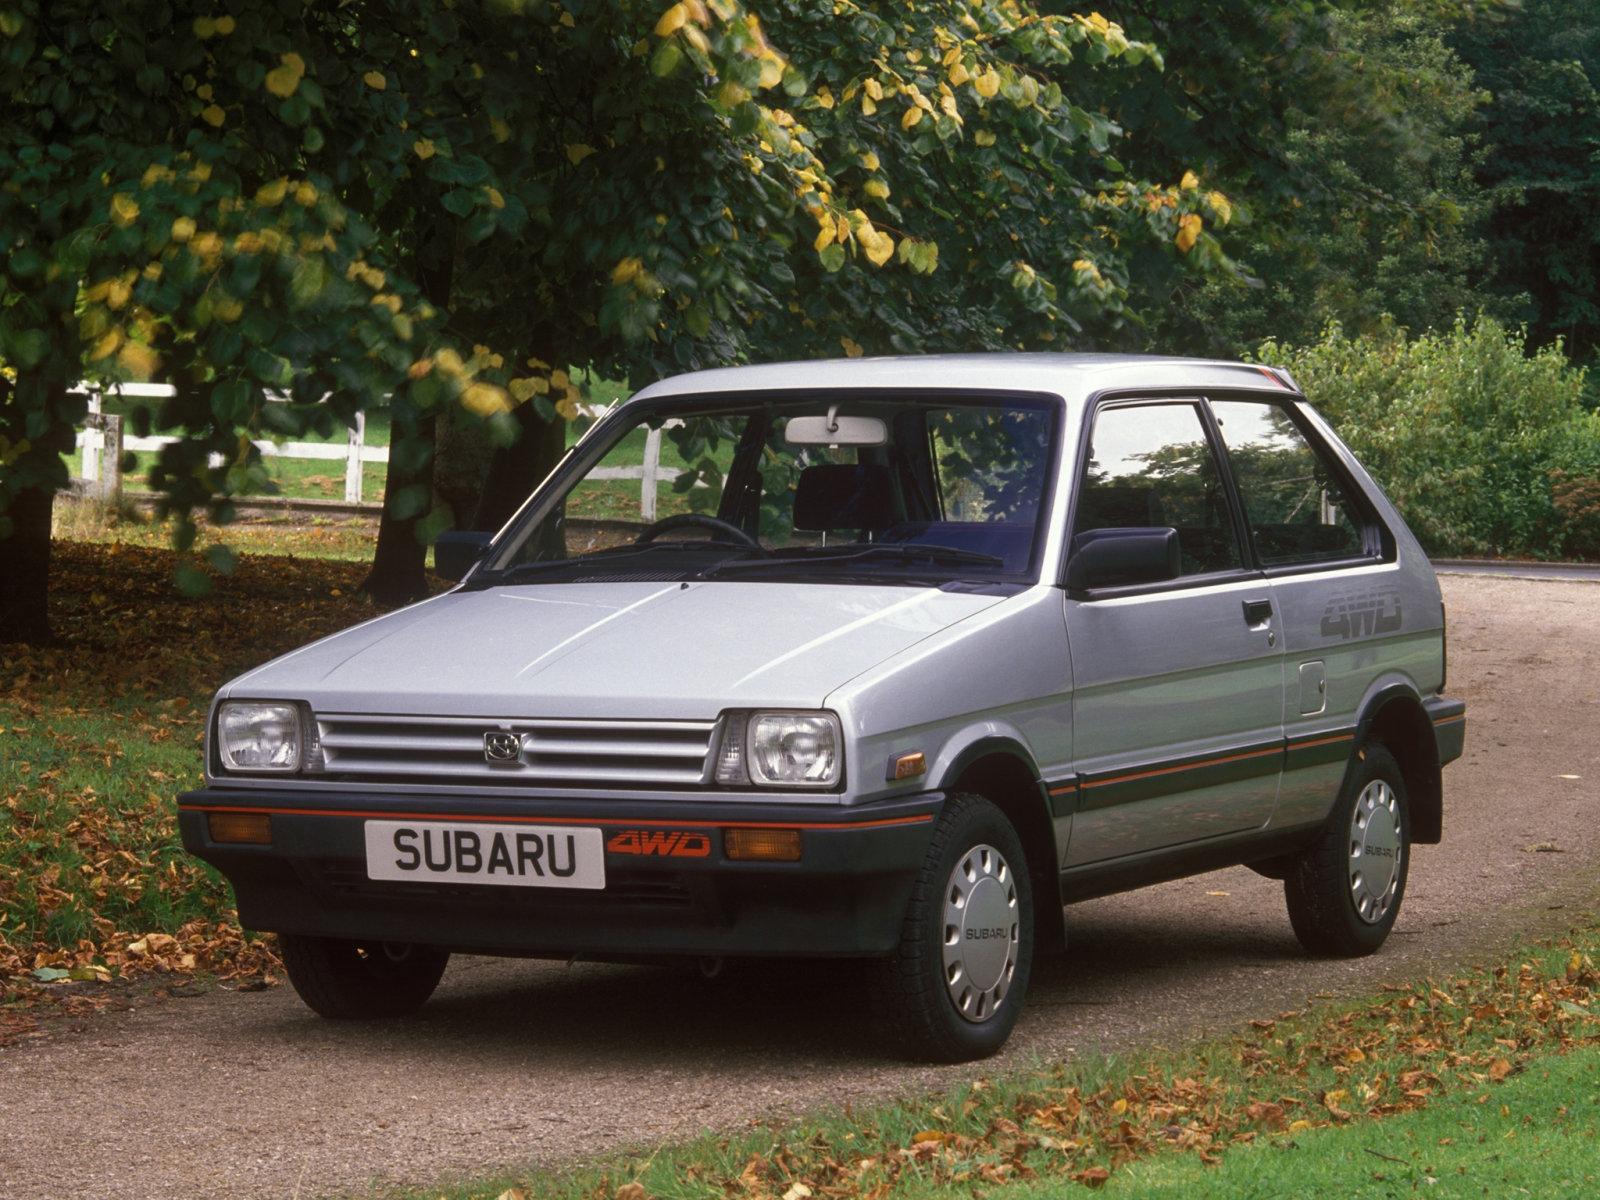 Фотографии автомобилей Subaru Justy / Субару Джасти (1984 - 1988 ...